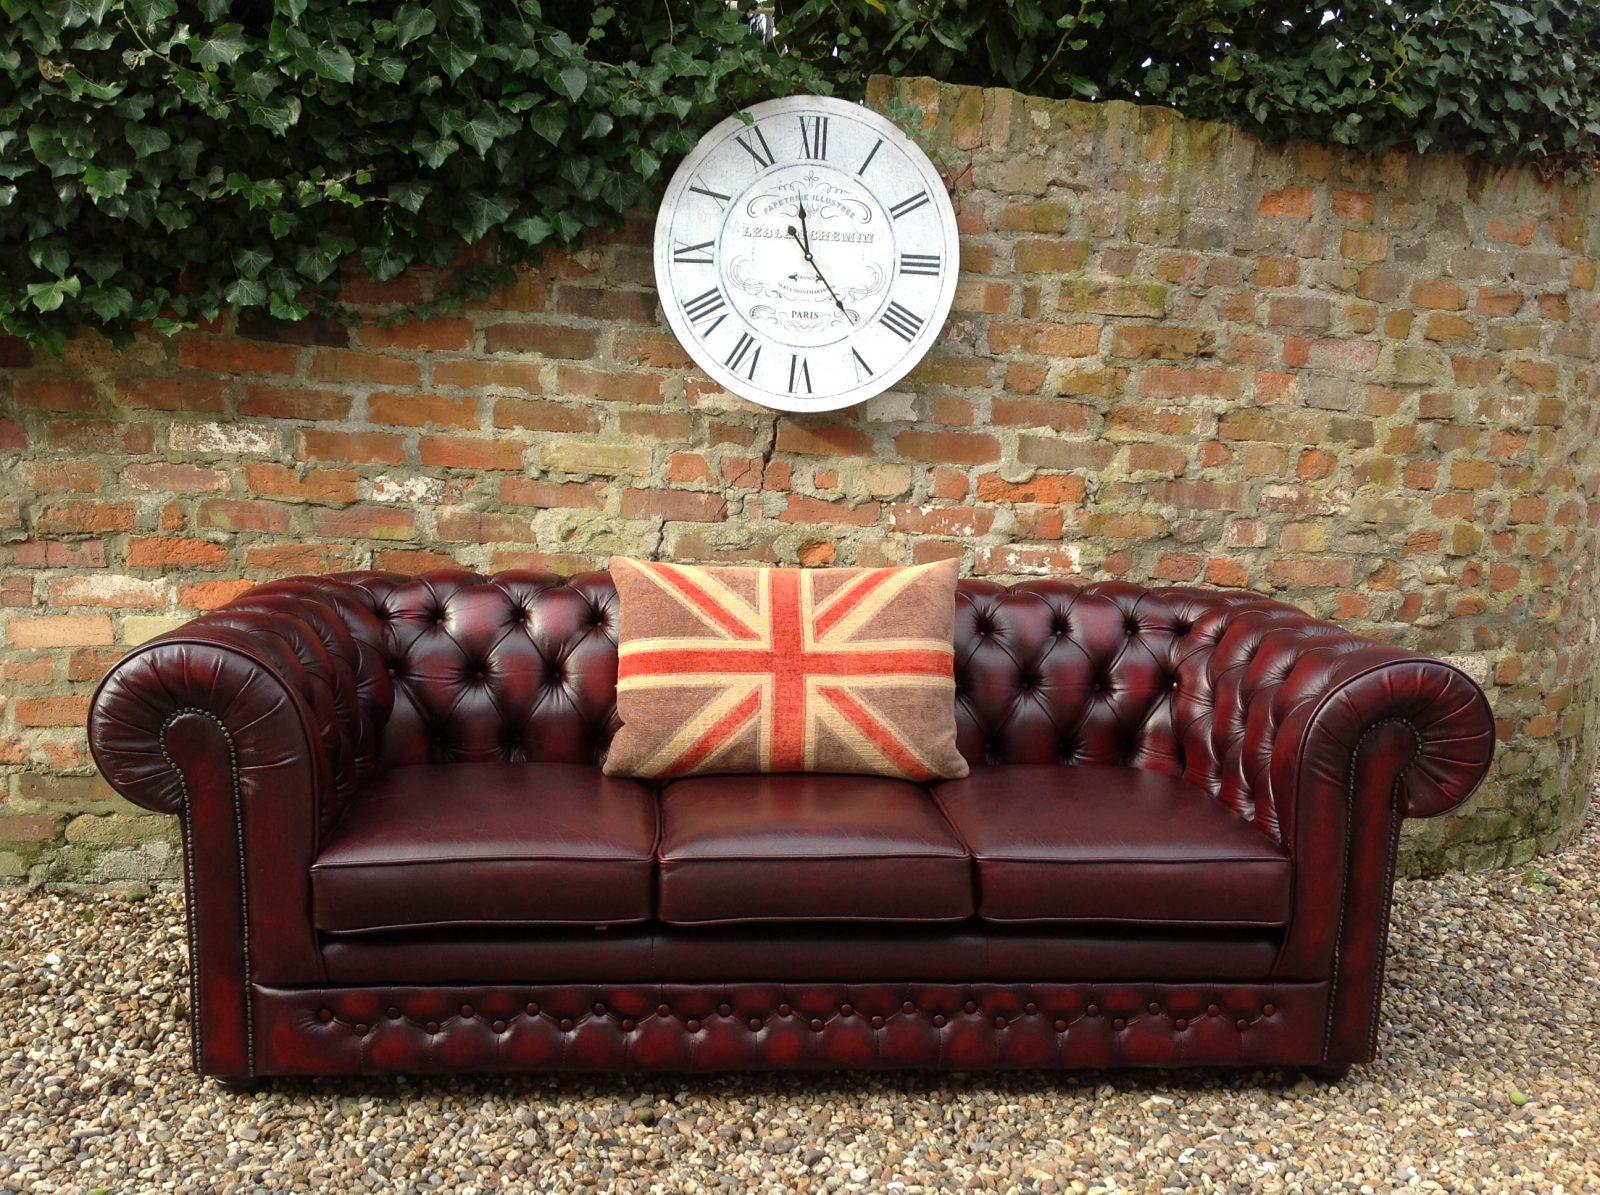 Thomas Lloyd Oxblood Chesterfield Sofa.